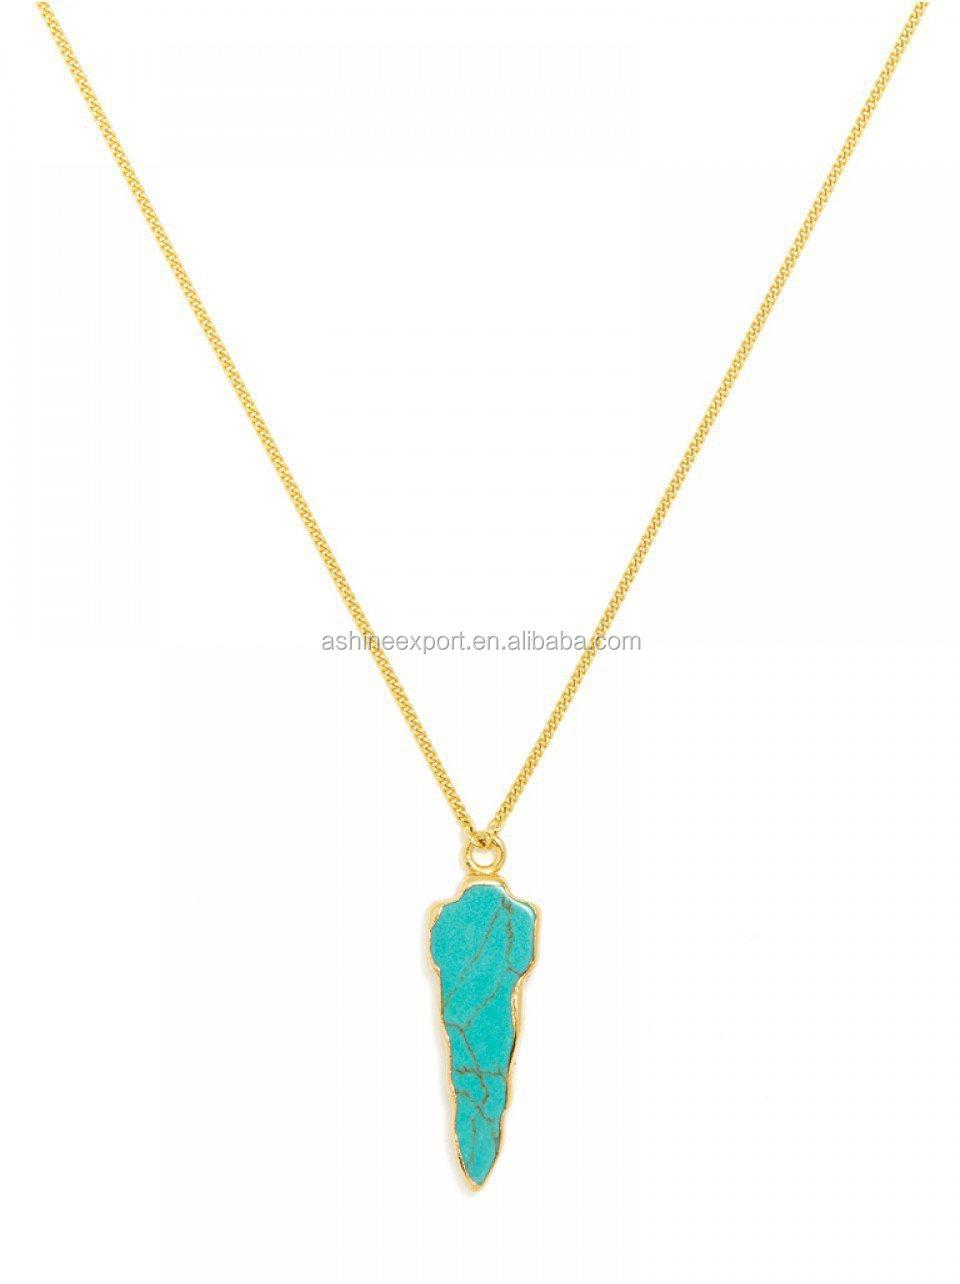 2015fashion Simple Jewelry Turquoise Arrowhead Pendant Gold ...